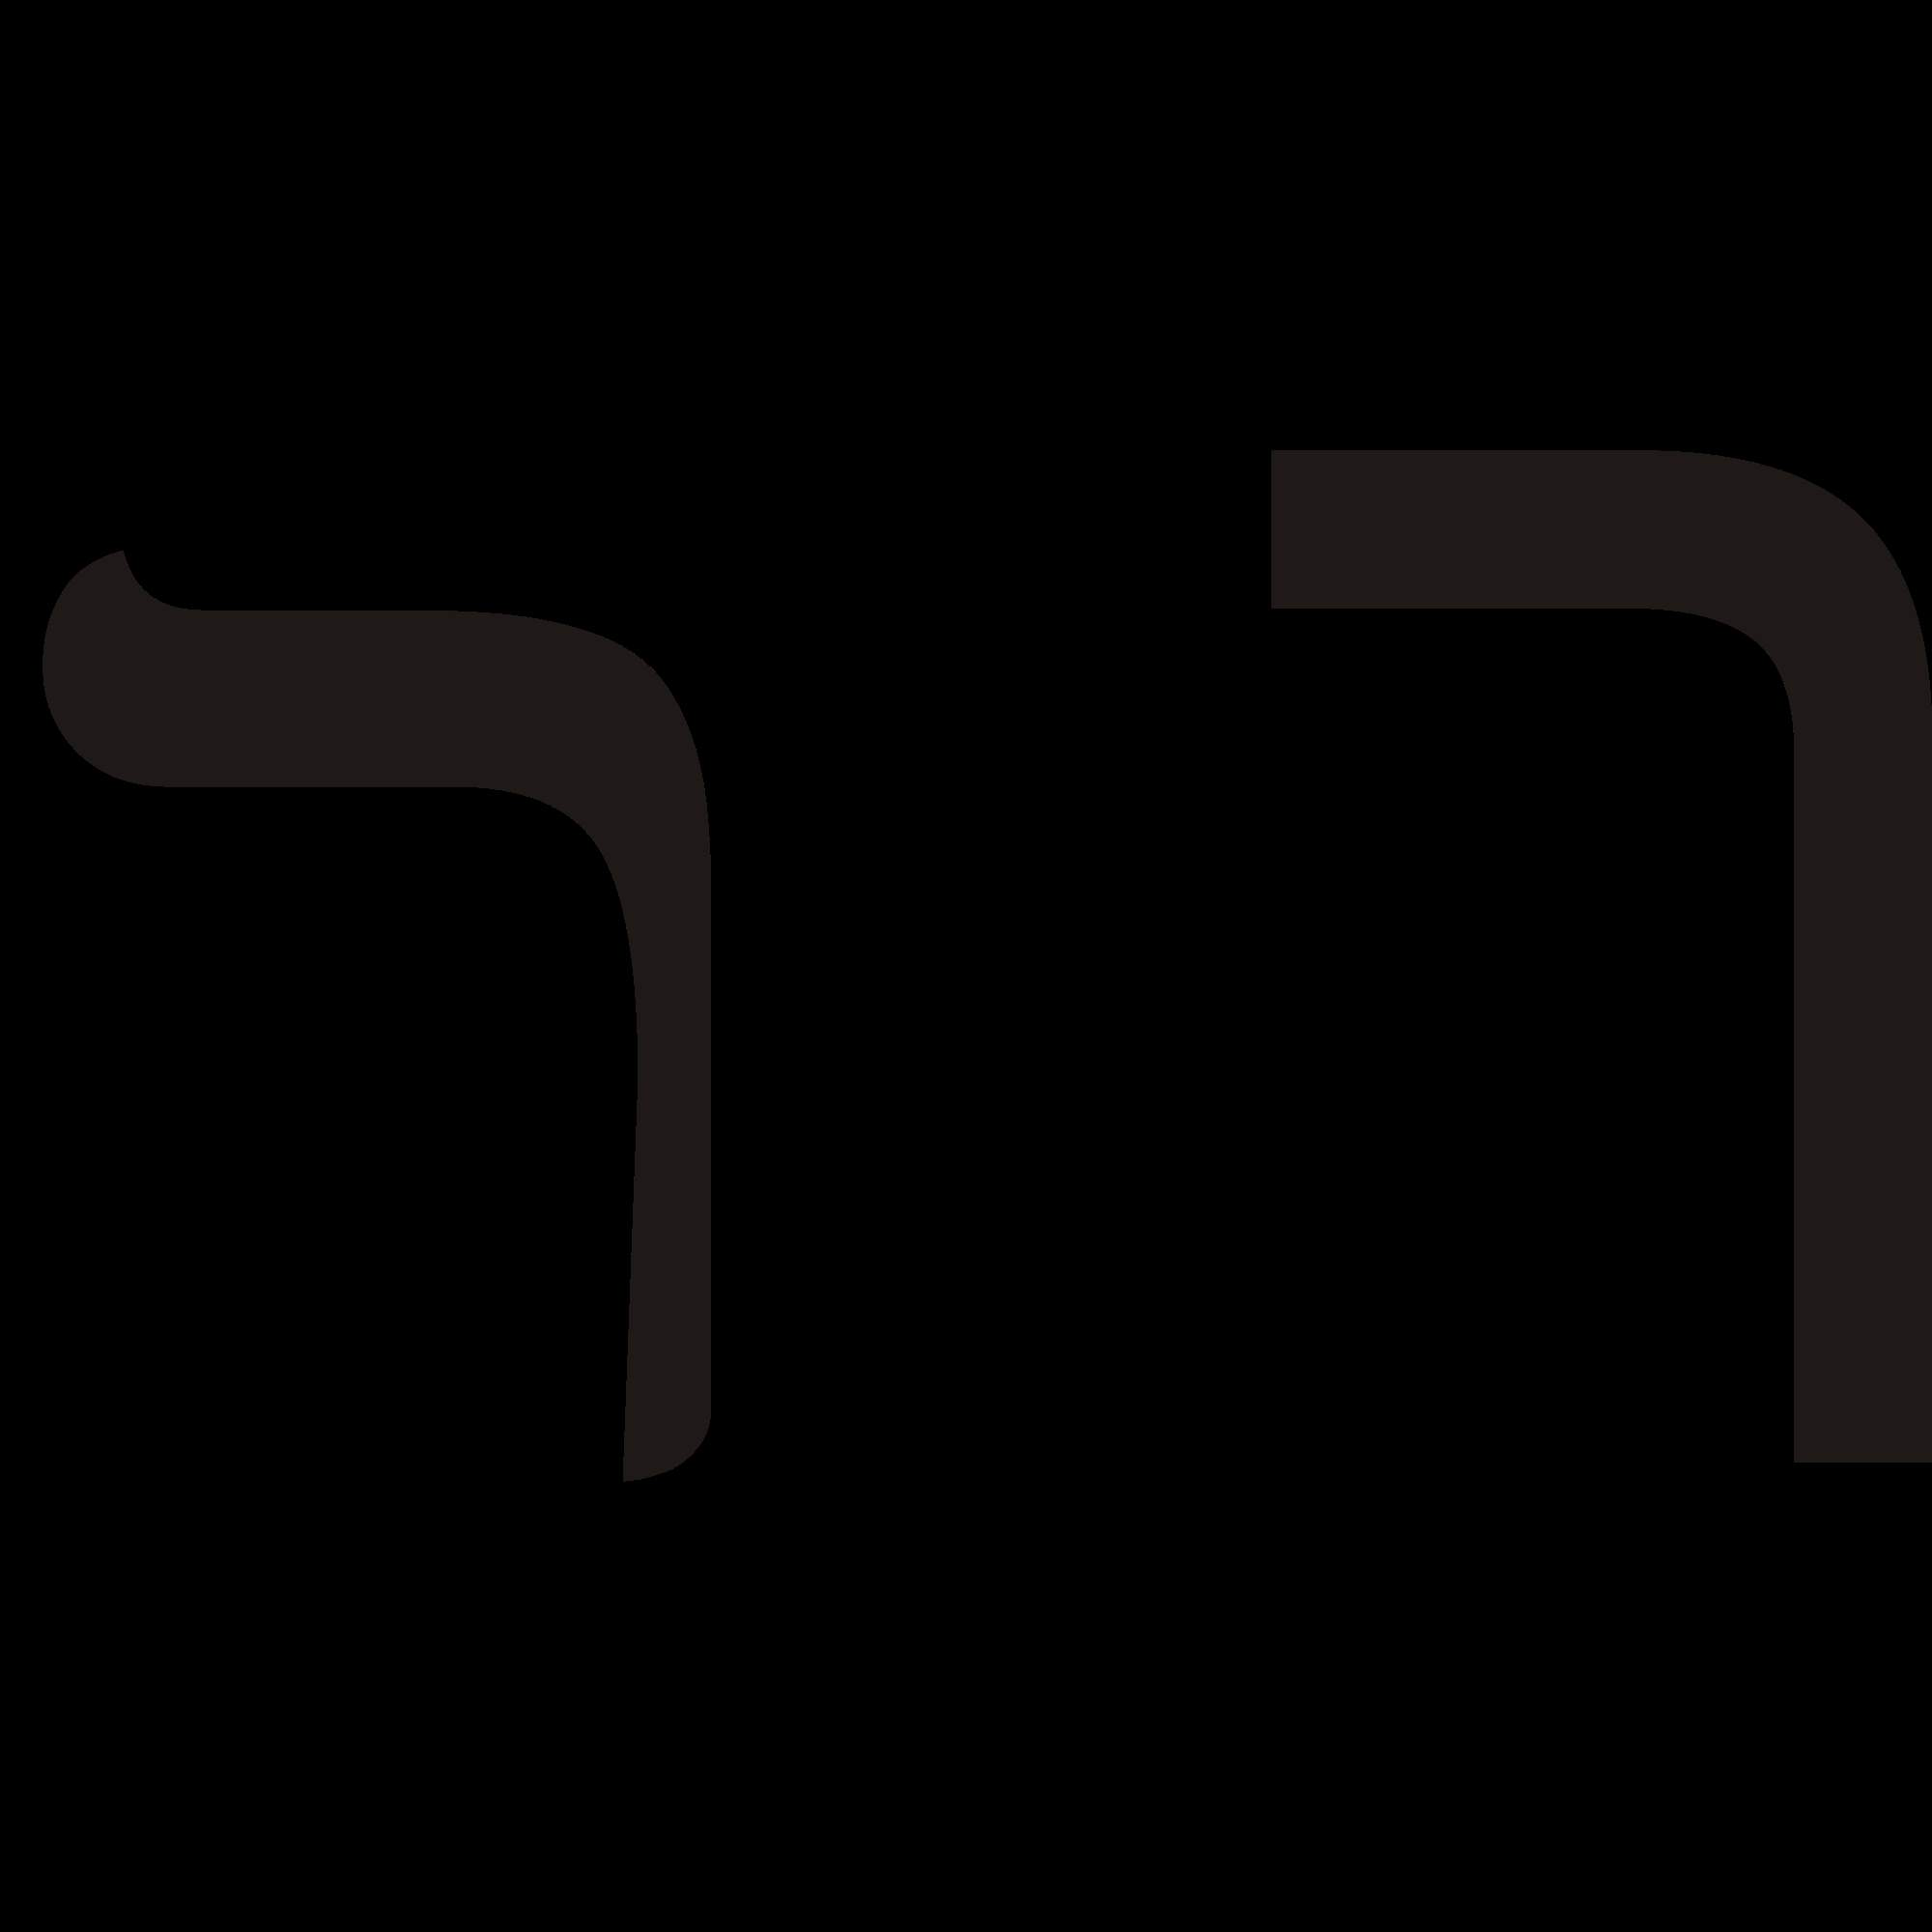 Hebrew letter reshg